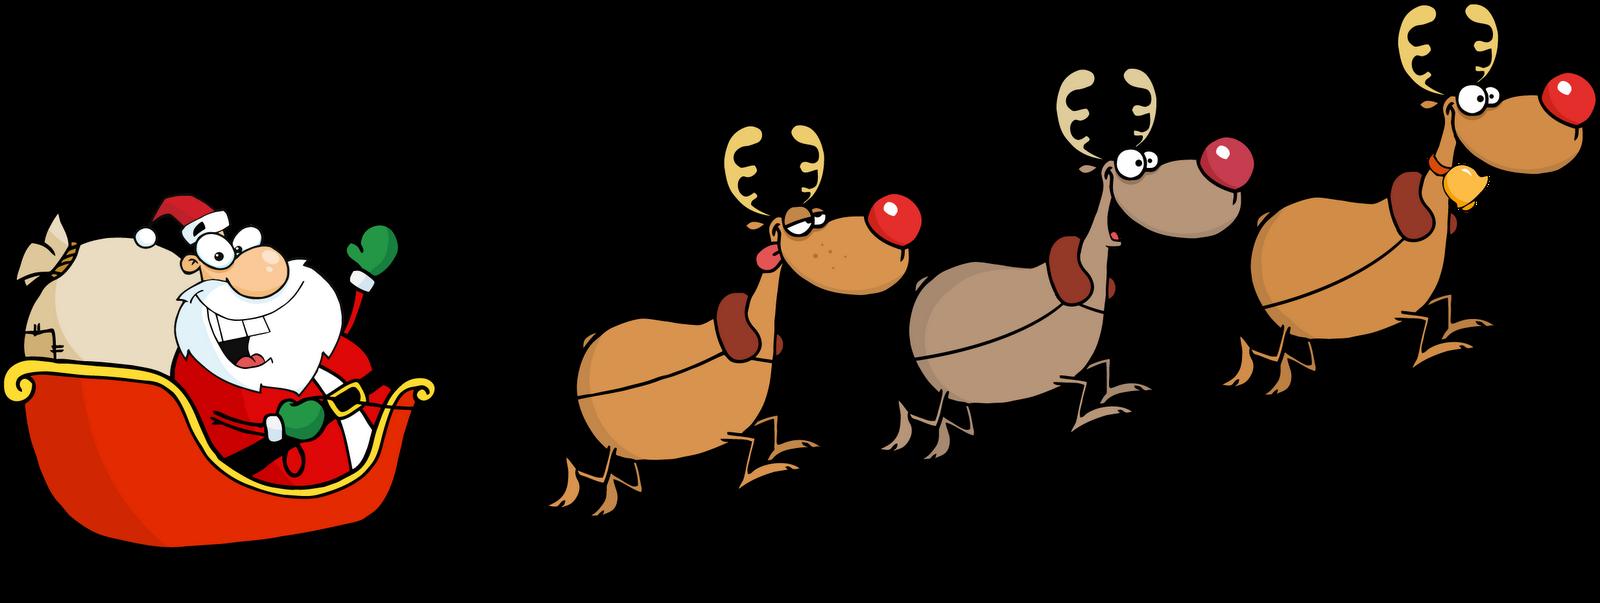 Clipart reindeer silver reindeer. Forgetmenot christmas and santa